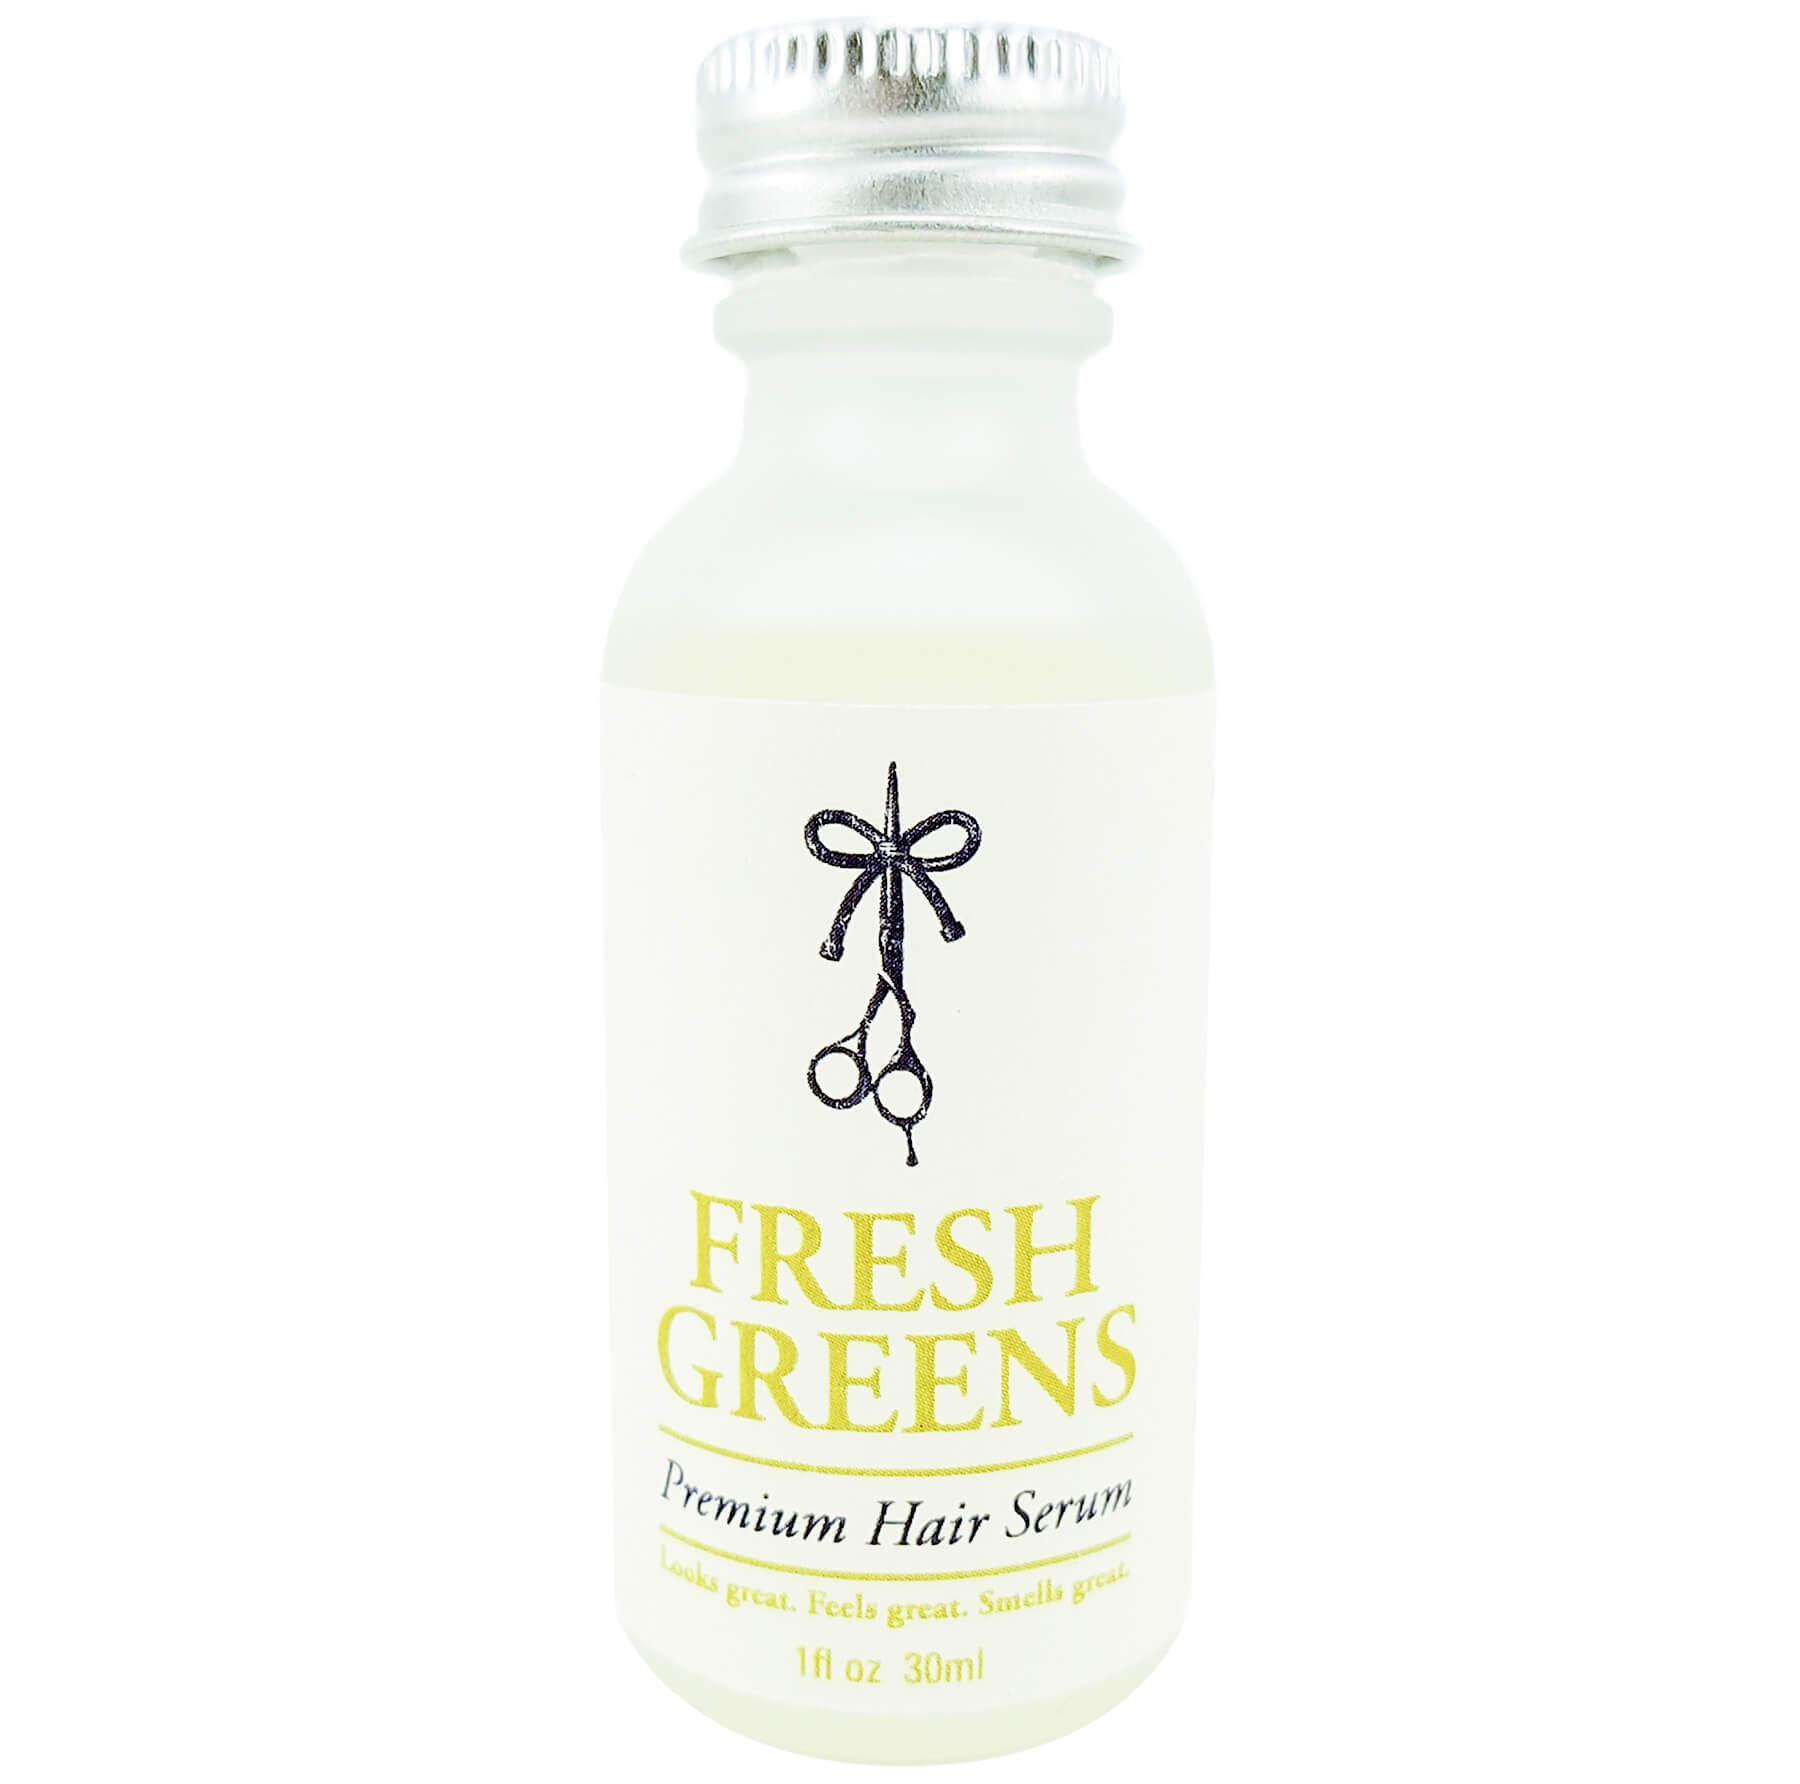 Fresh Greens Hair Serum